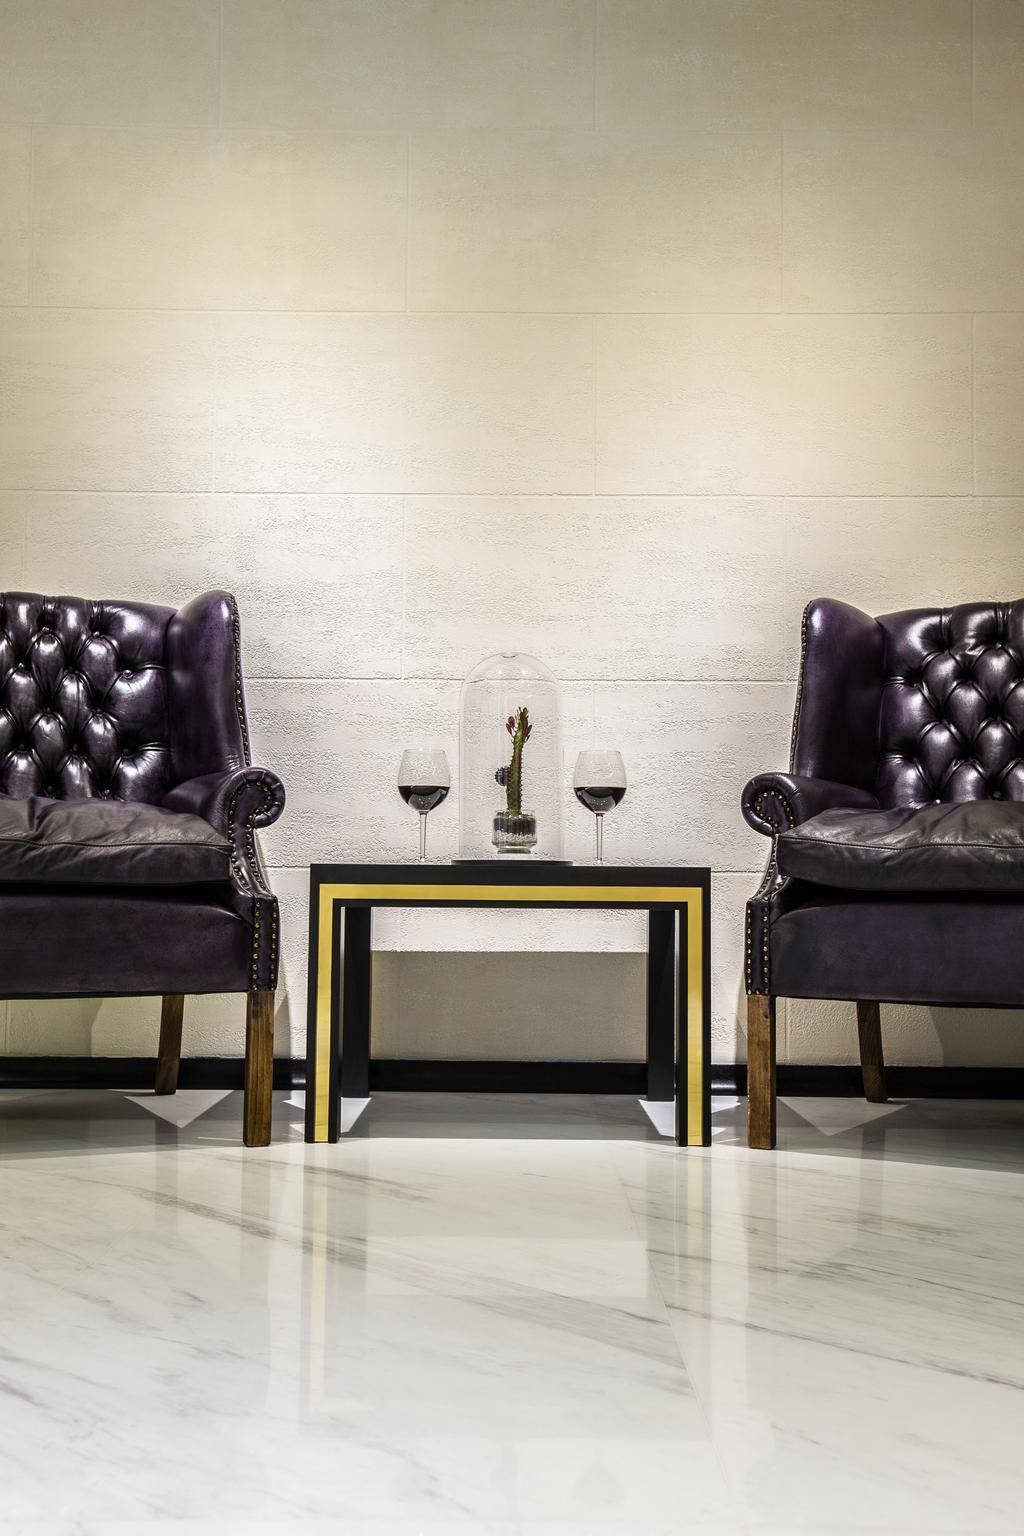 Summerhaus Office, Commercial, Interior Designer, Summerhaus D'zign, Contemporary, Chair, Furniture